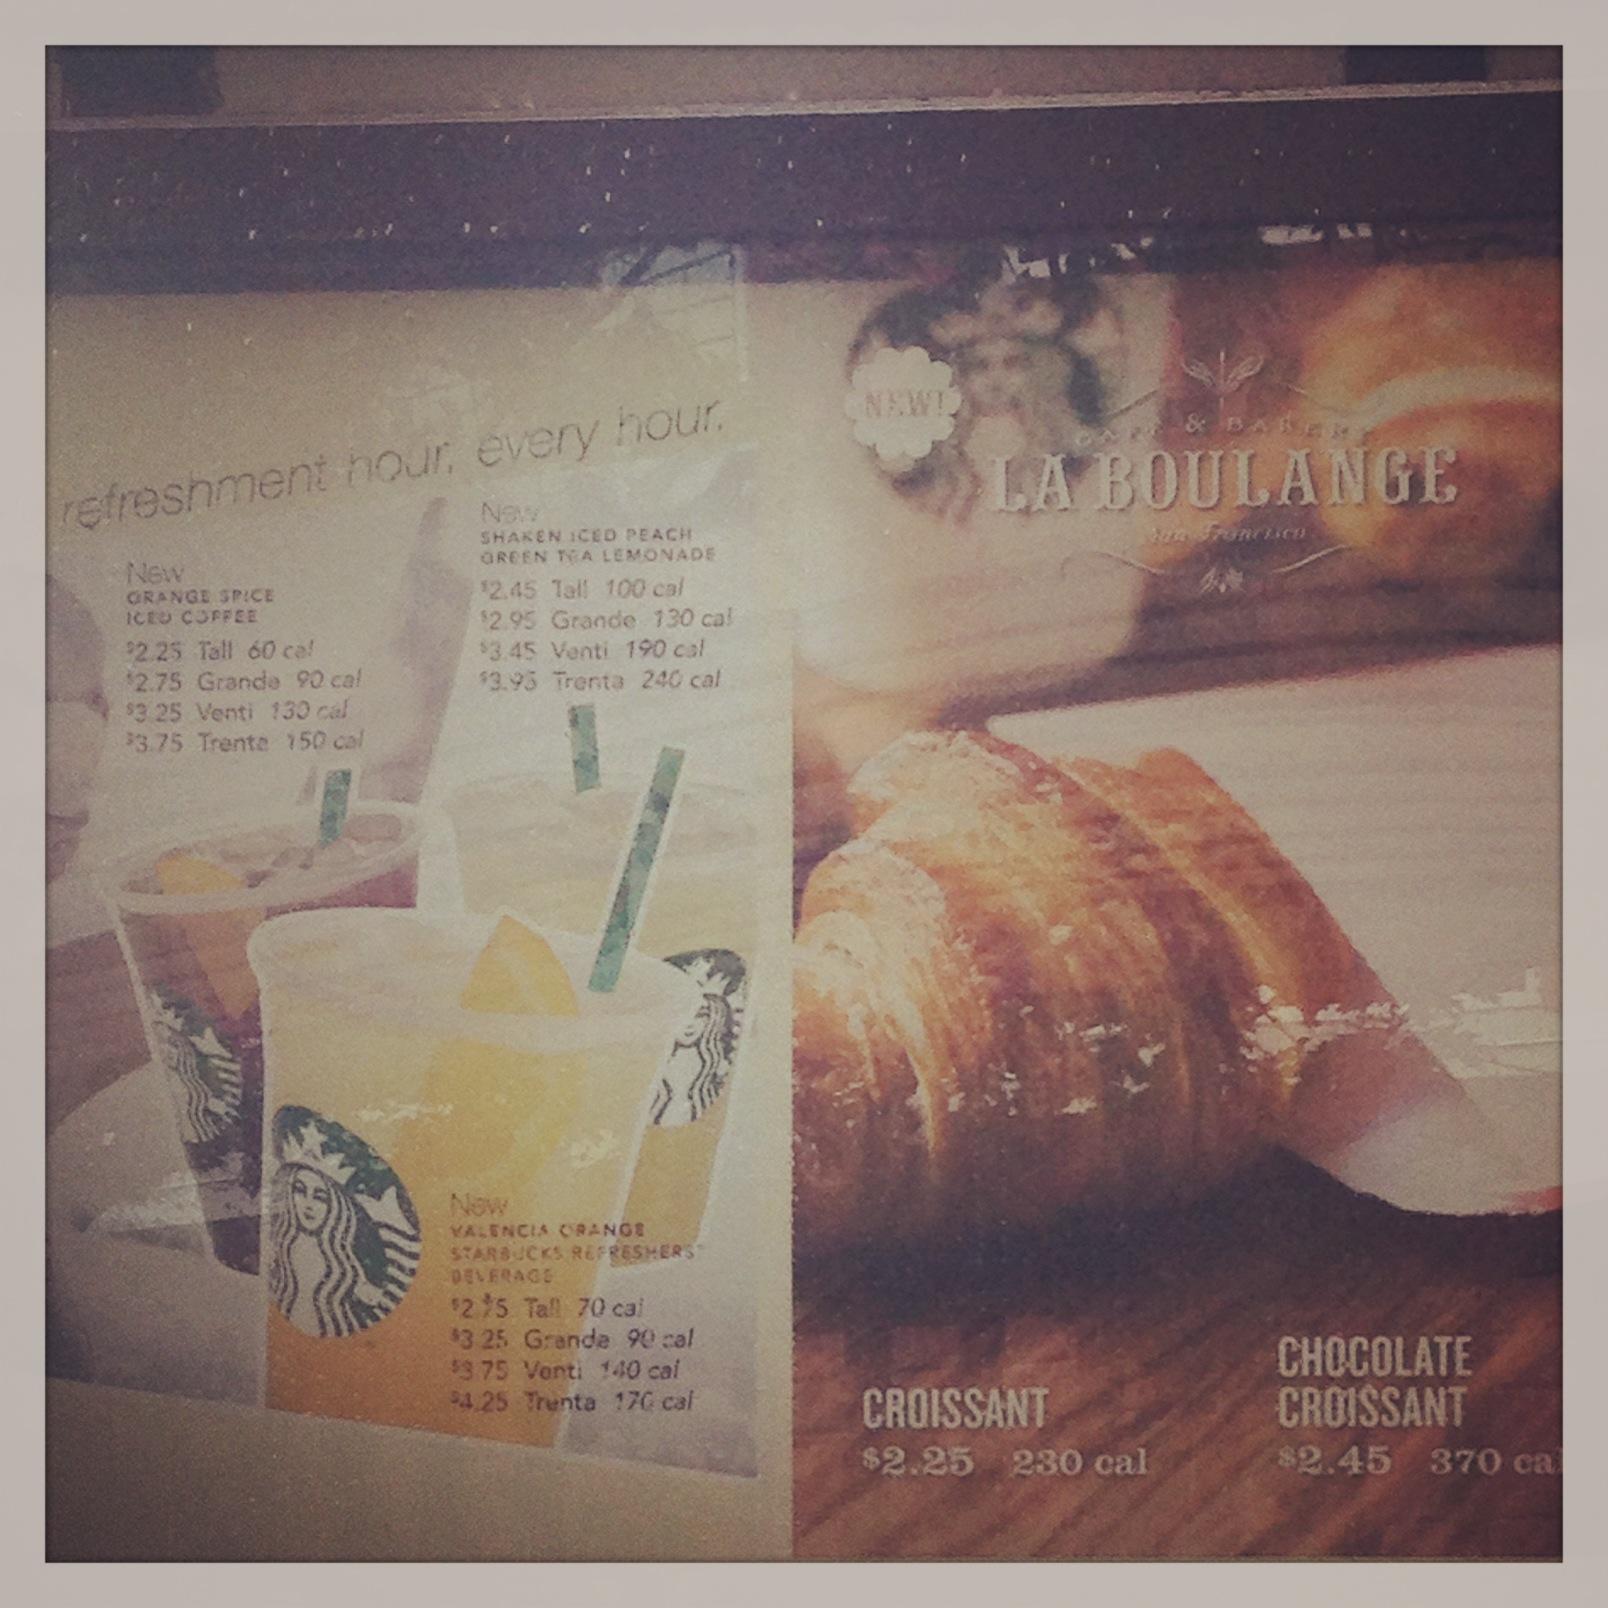 Starbucks Calorie menus